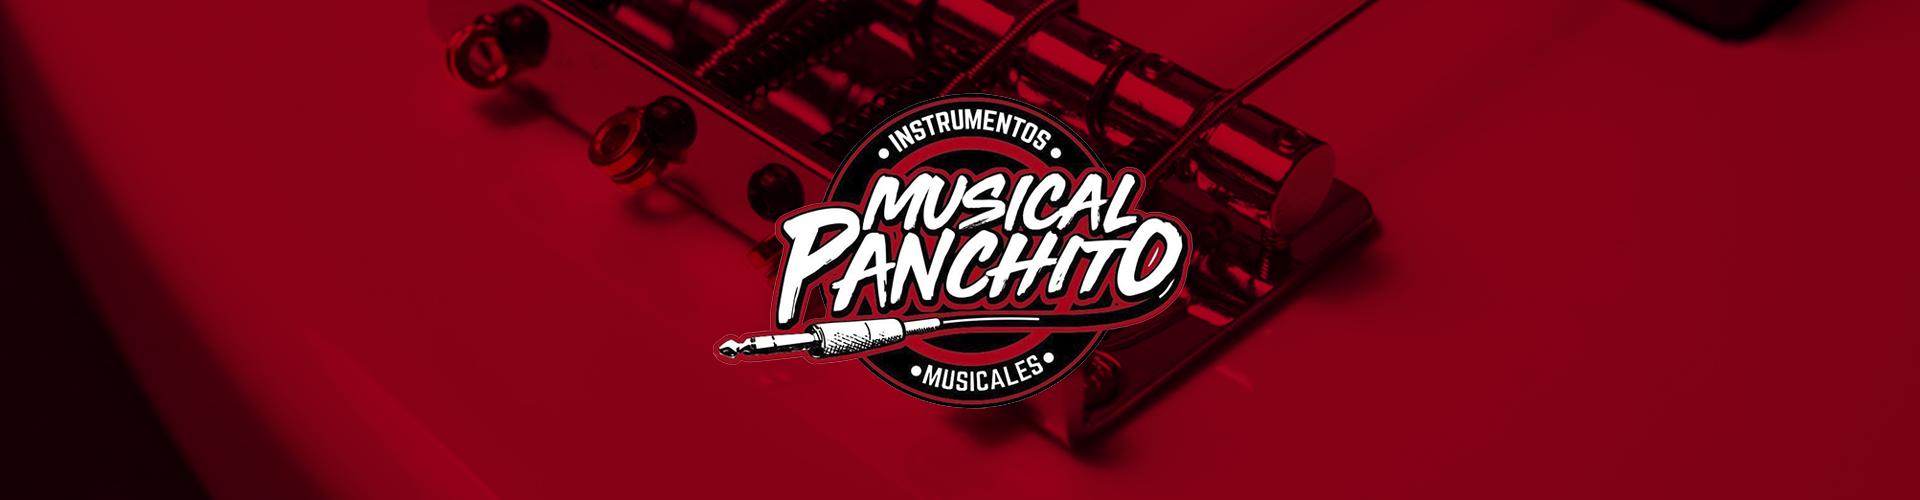 Musical Panchito